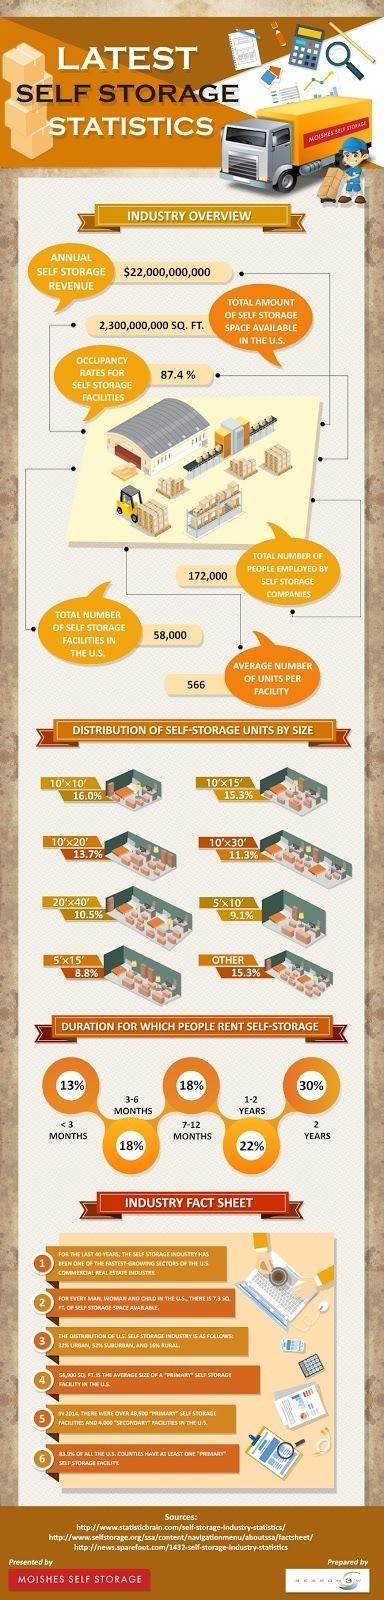 Latest Self Storage Statistics in US – Infographic | Photo Studio | Scoop.it